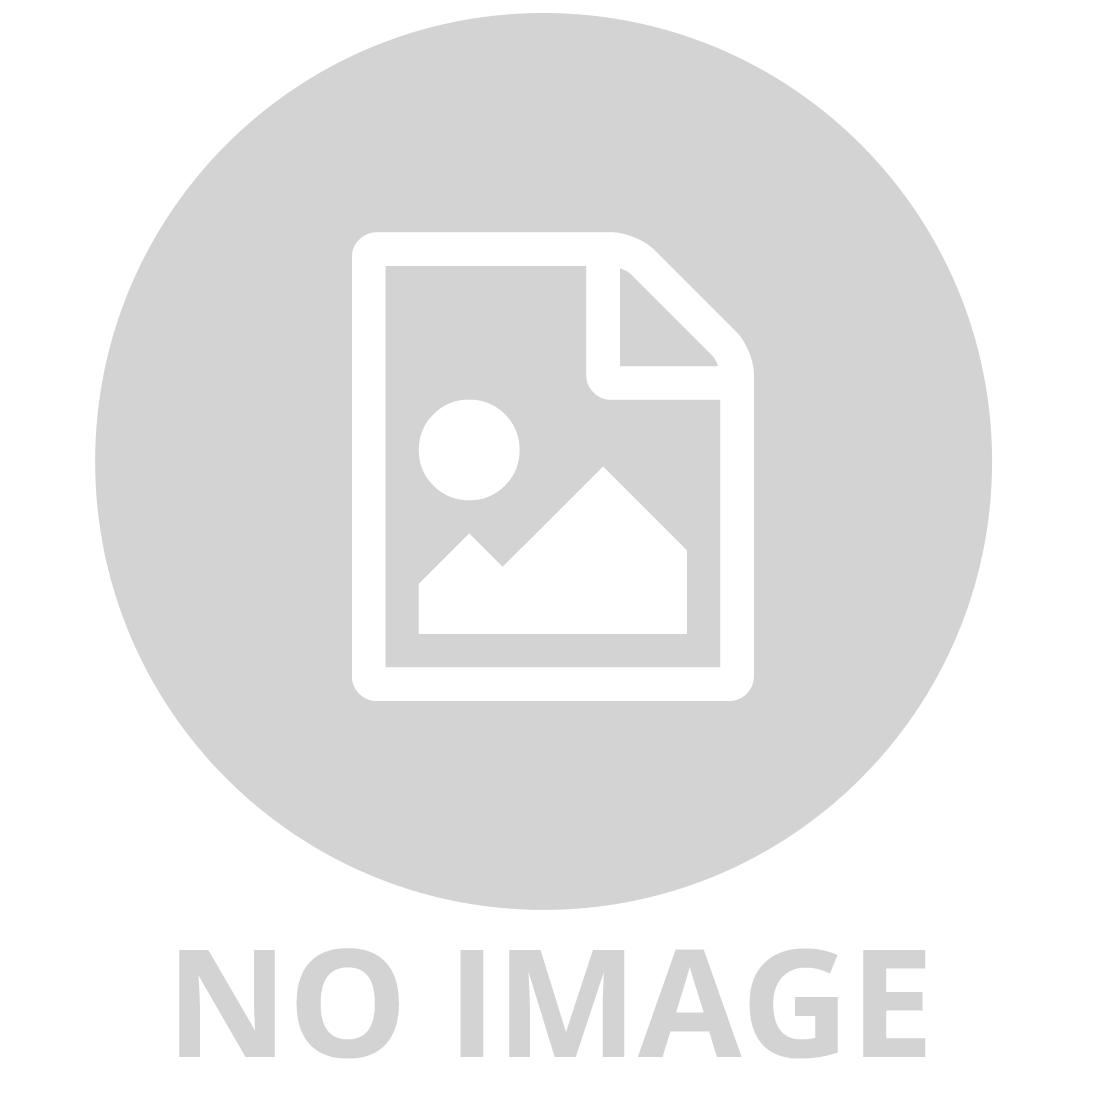 TAMIYA TS-9 BRITISH GREEN SPRAY PAINT FOR PLASTICS